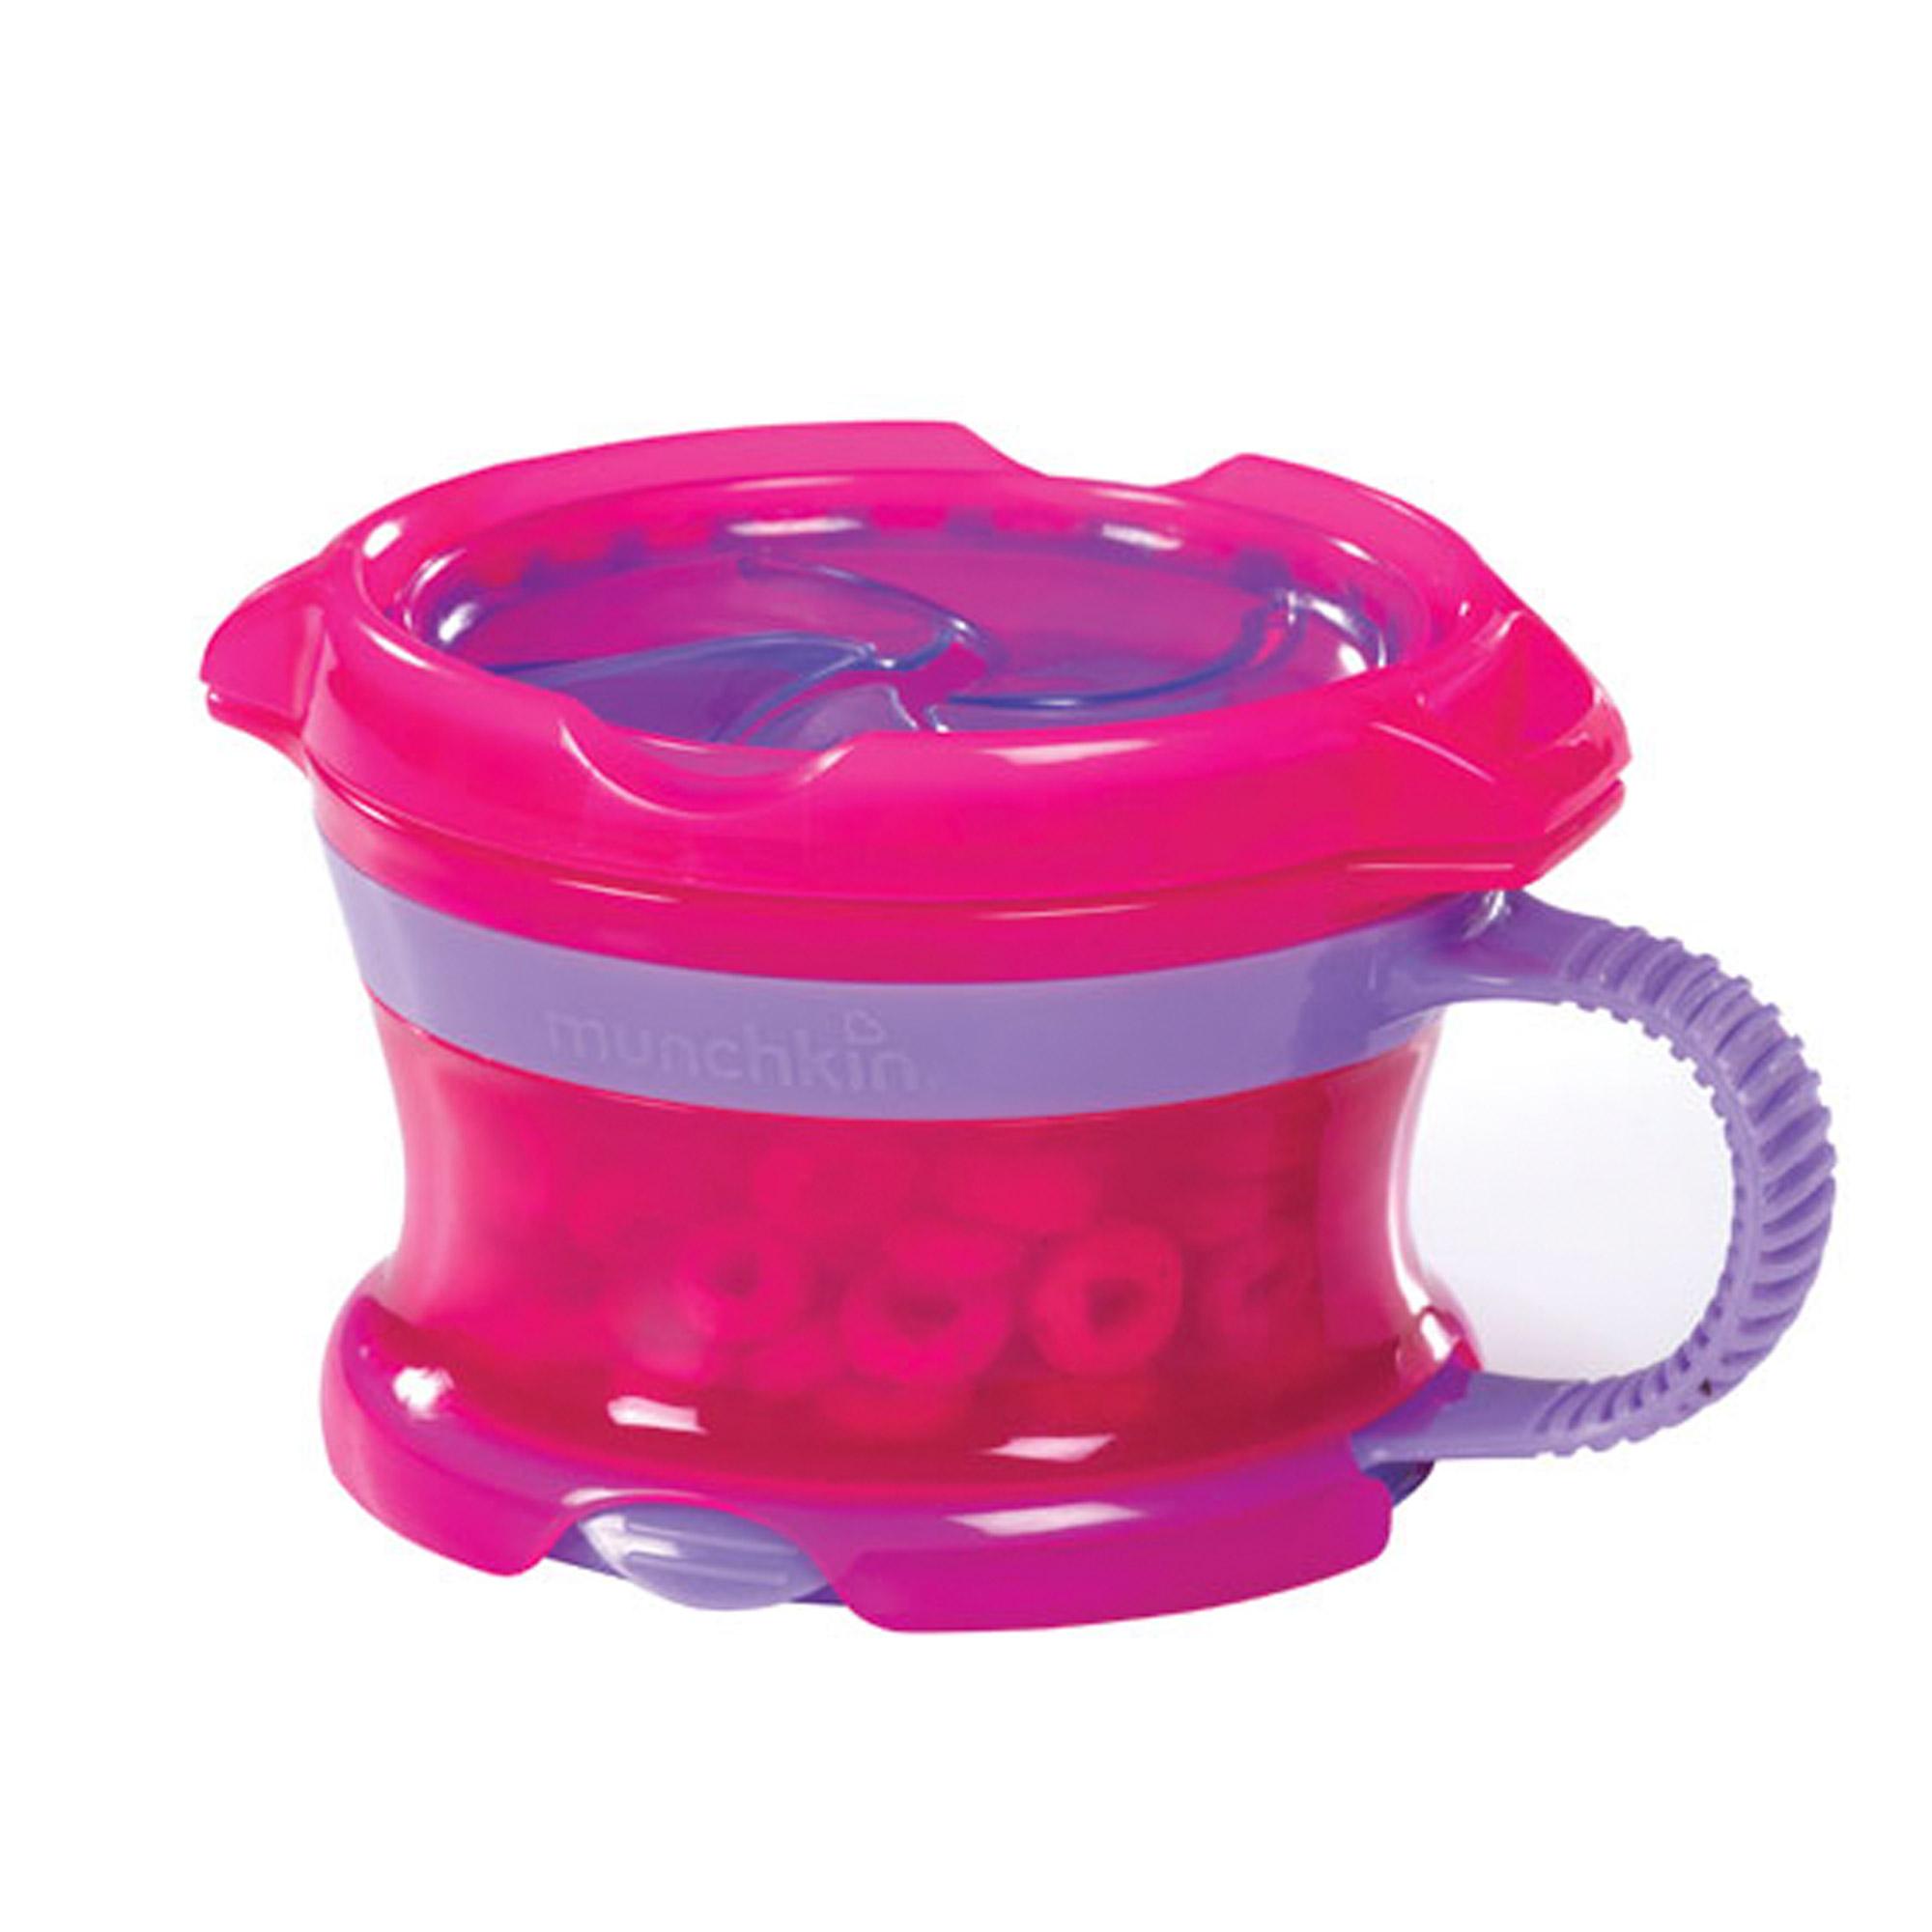 Контейнер Munchkin Поймай печенье Deluxe розовый 12м+ контейнер munchkin поймай печенье голубой 12м